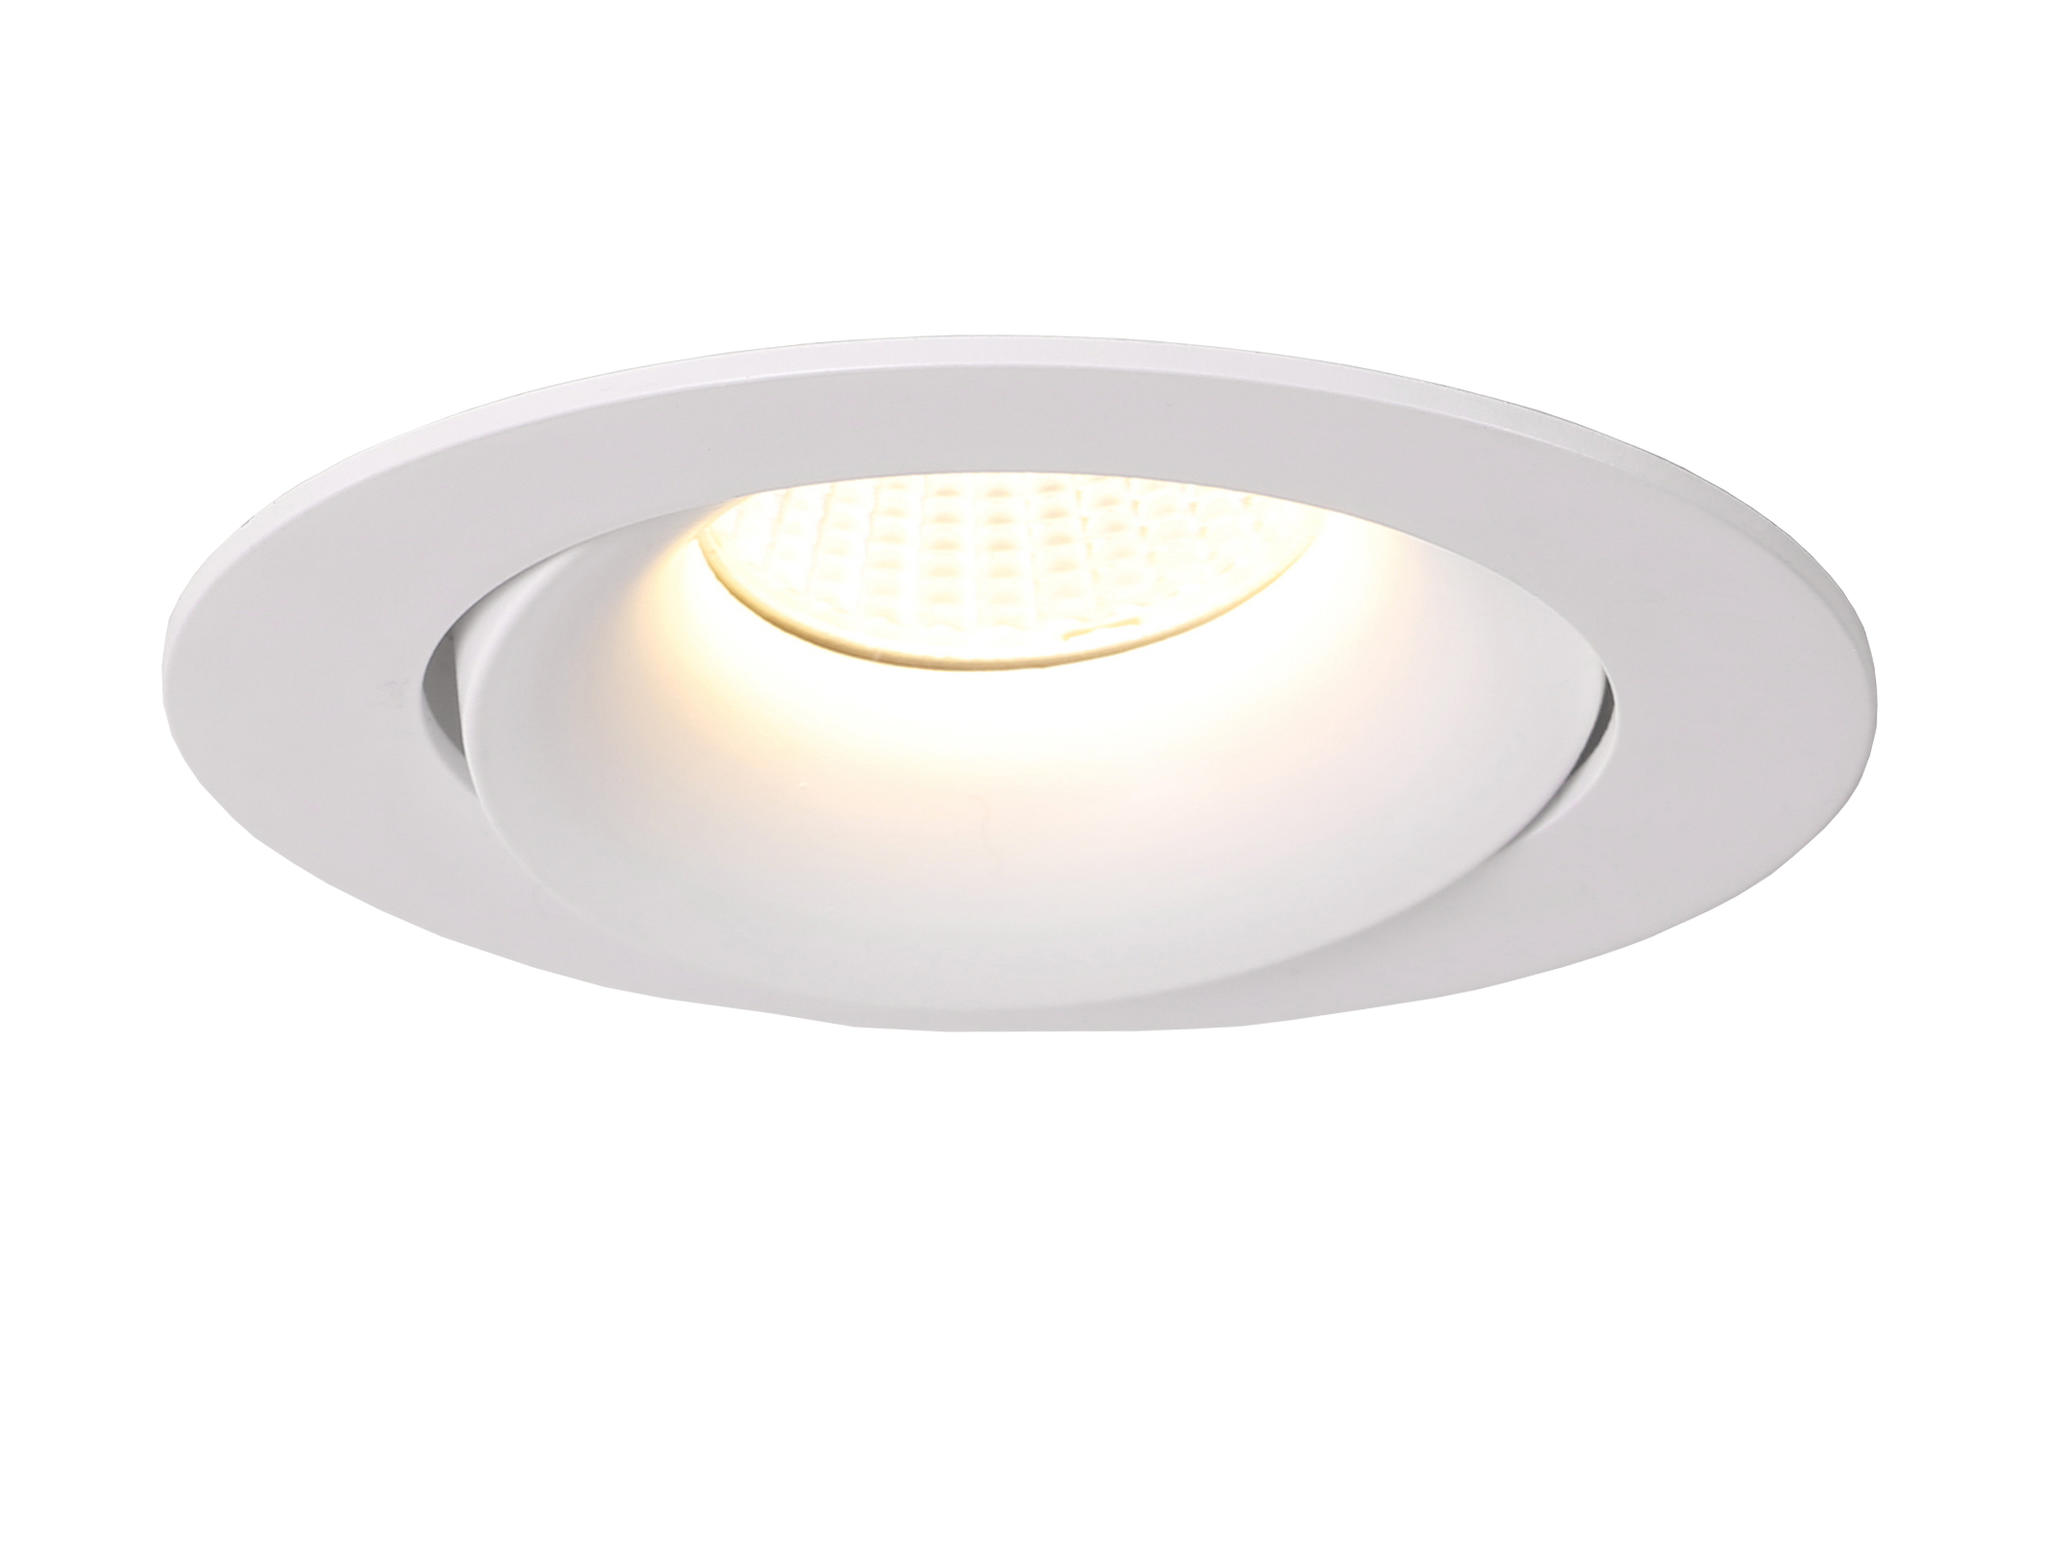 Grote Slaapkamer Lamp : Grote moderne glas tafellamp ferea